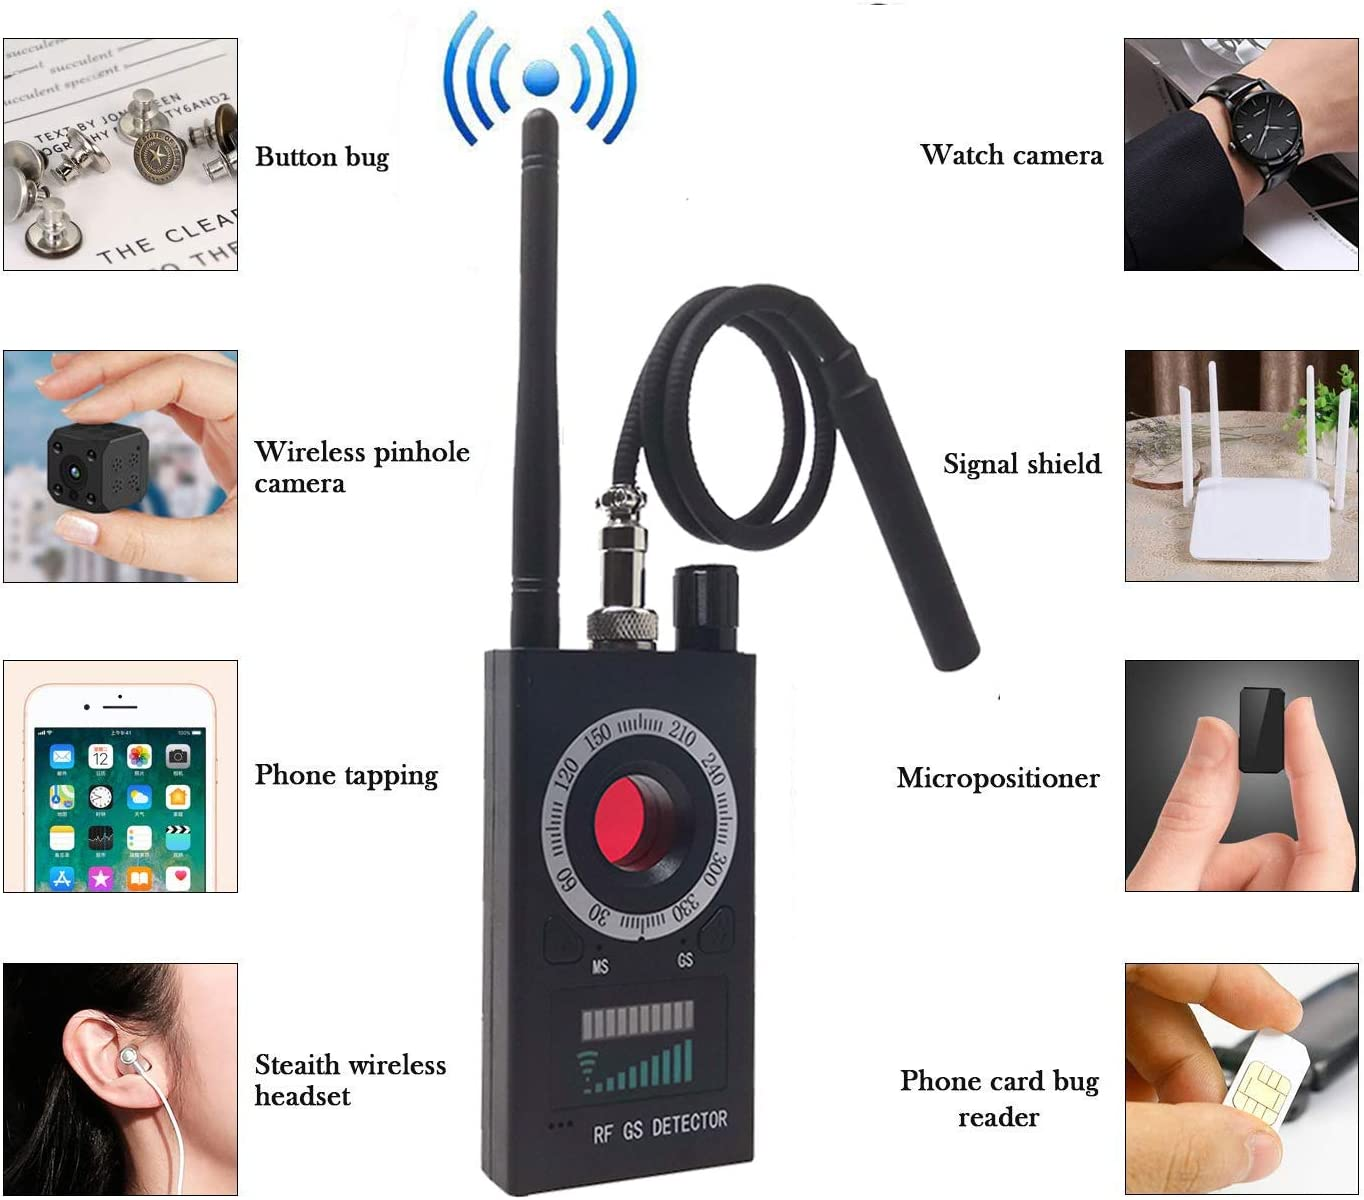 Military-Top Version Anti Spy RF Detector Hidden Camera Detector Bug GPS Wireless Signal Alarm Scanner Detection Device